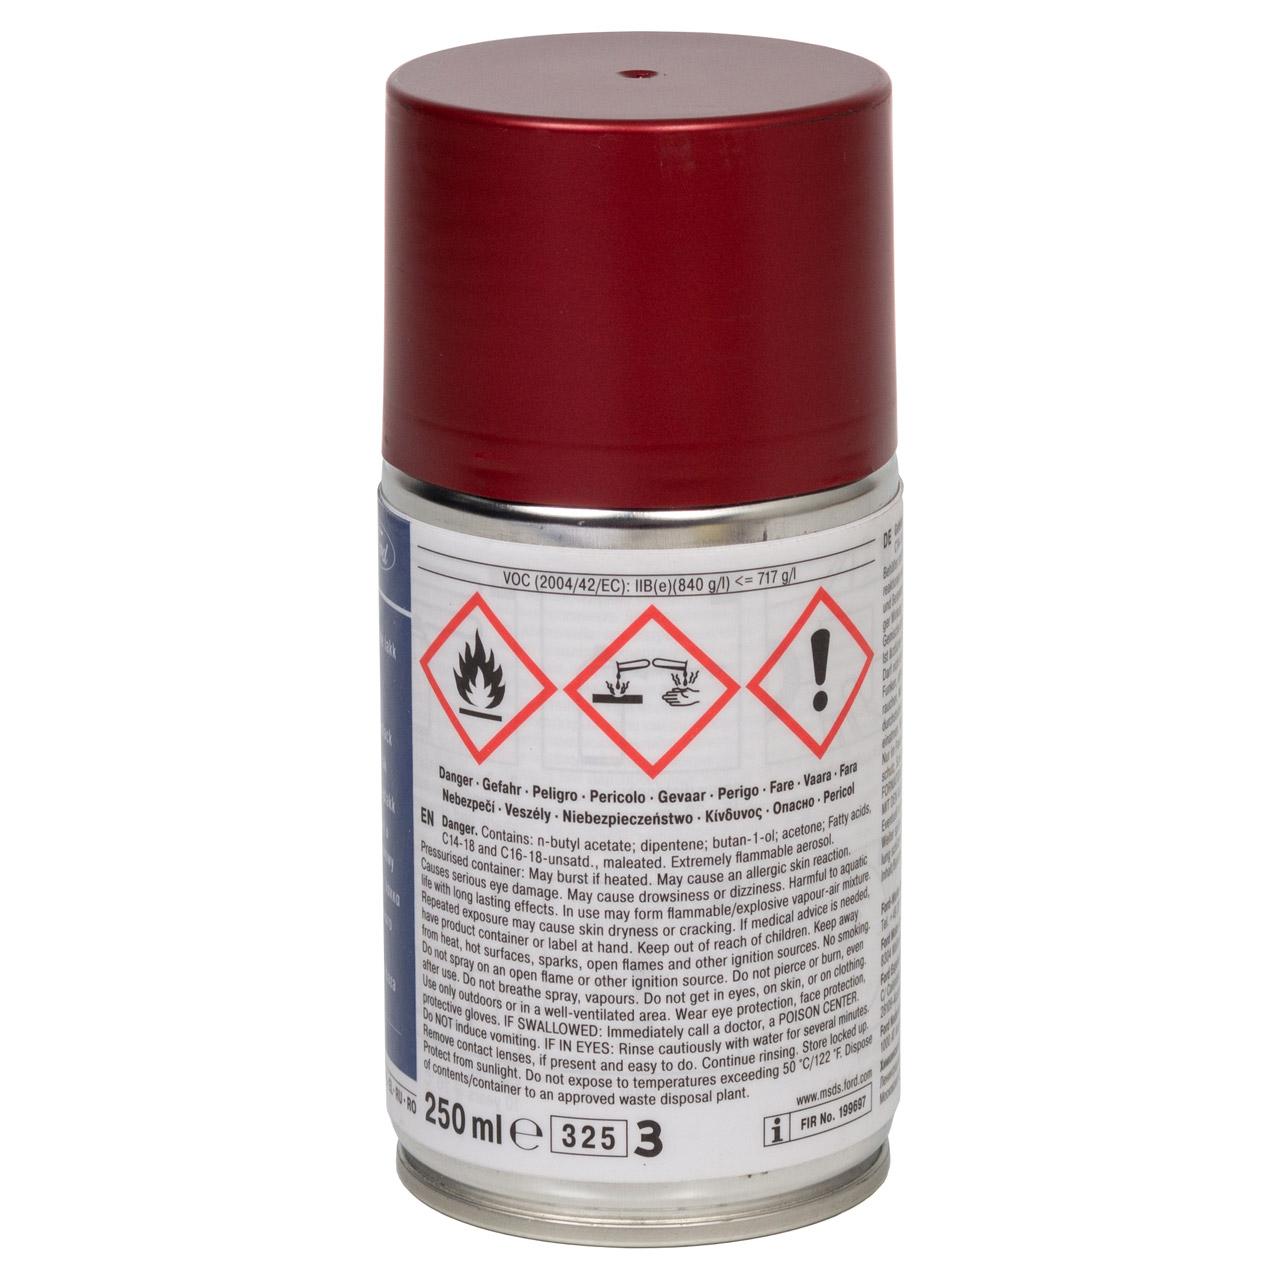 ORIGINAL Ford Lack Sprühdose Spraydose Dose CANDY RED ROT Metallic 250ml 2280726